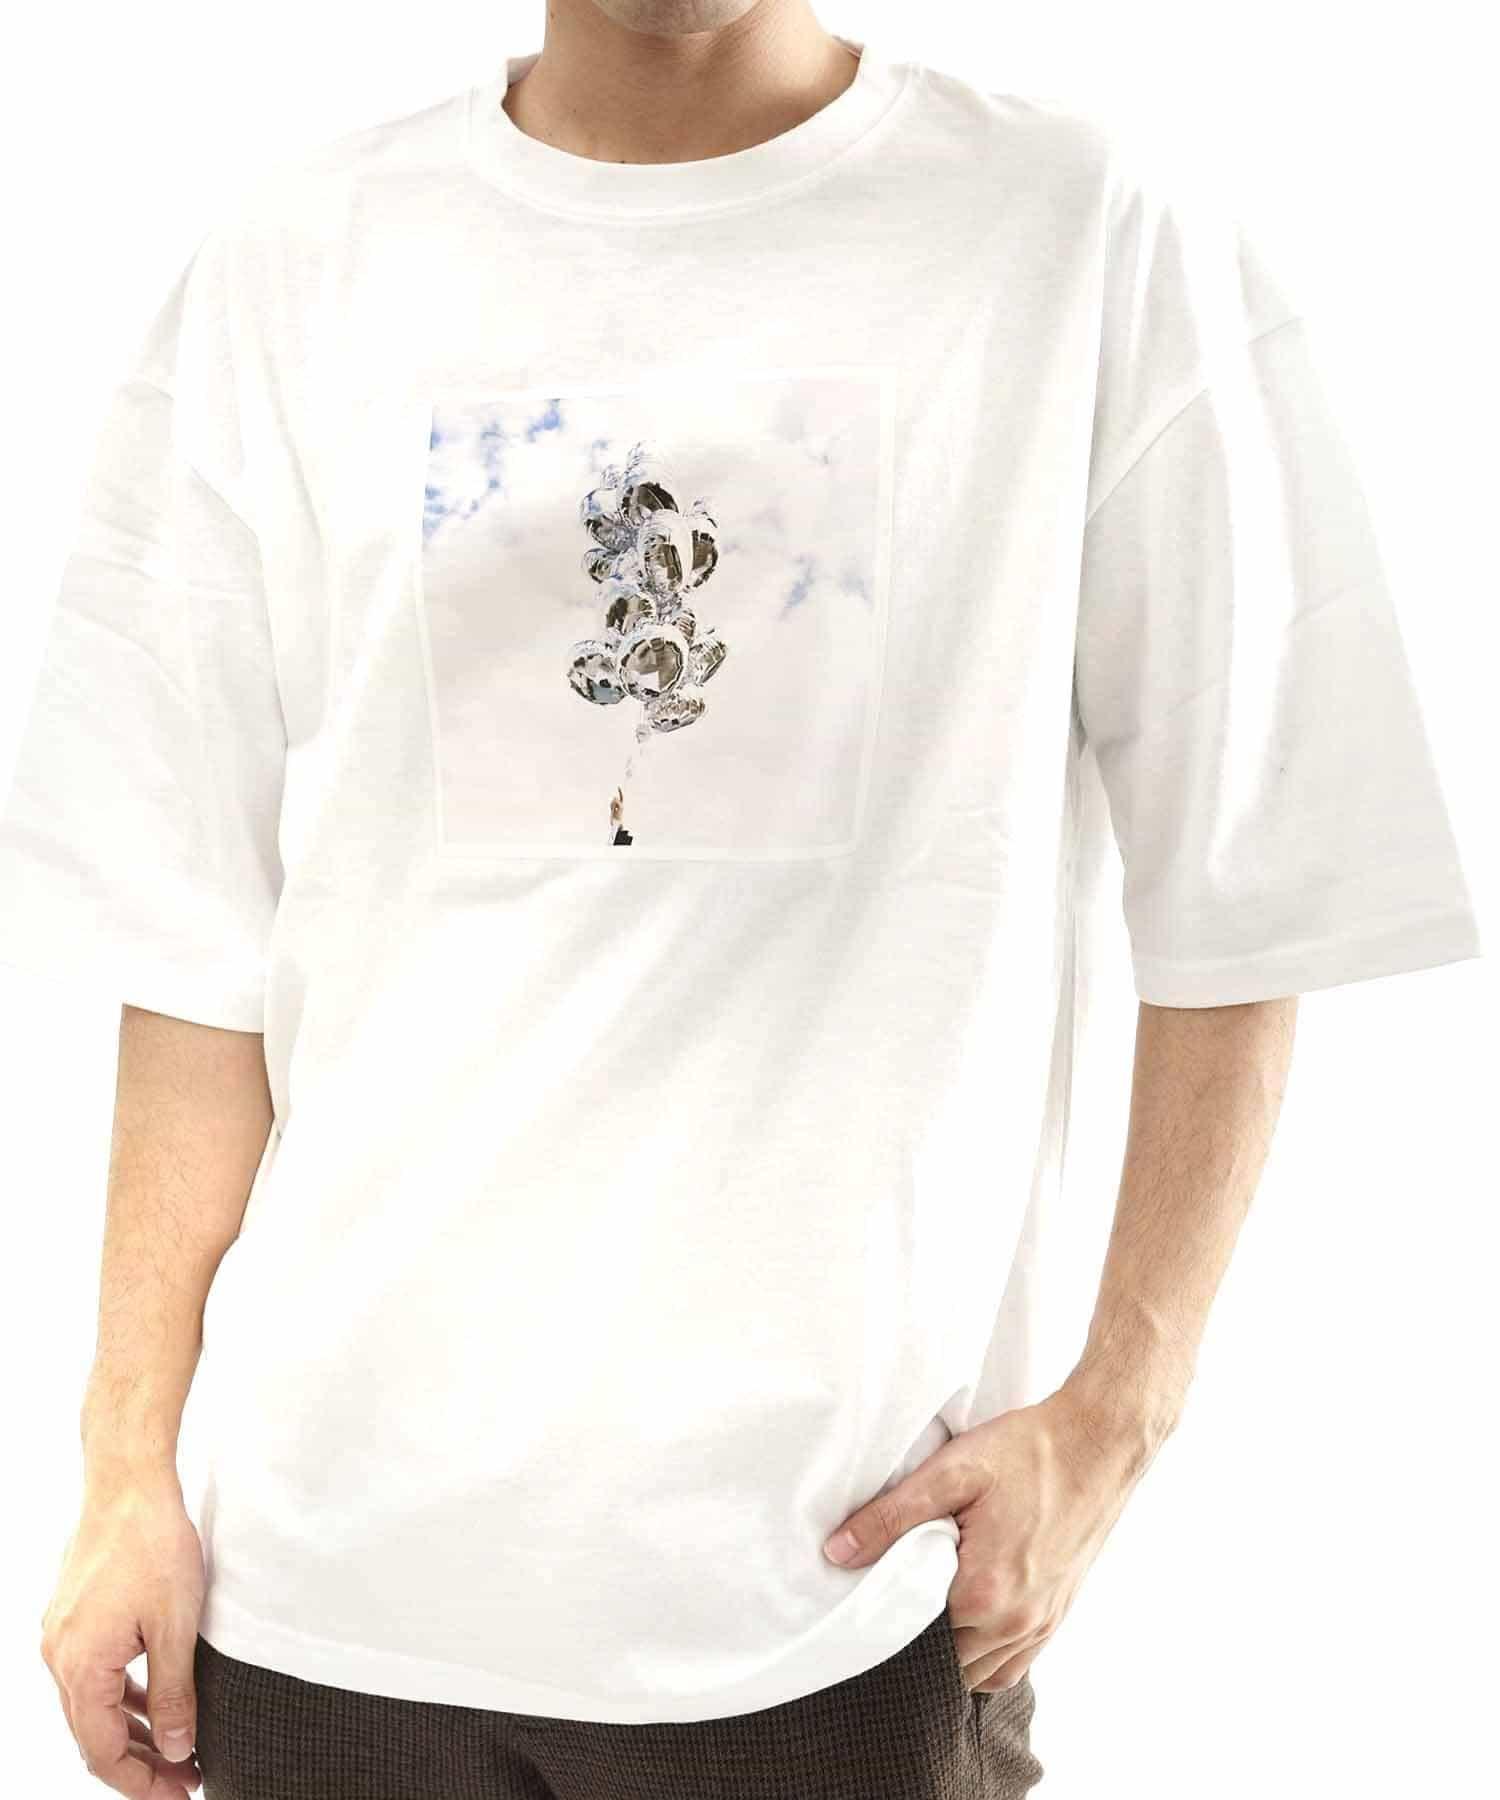 3COINS(スリーコインズ) ライフスタイル 【JUKEBOX PROJECT】AWATシャツ その他7